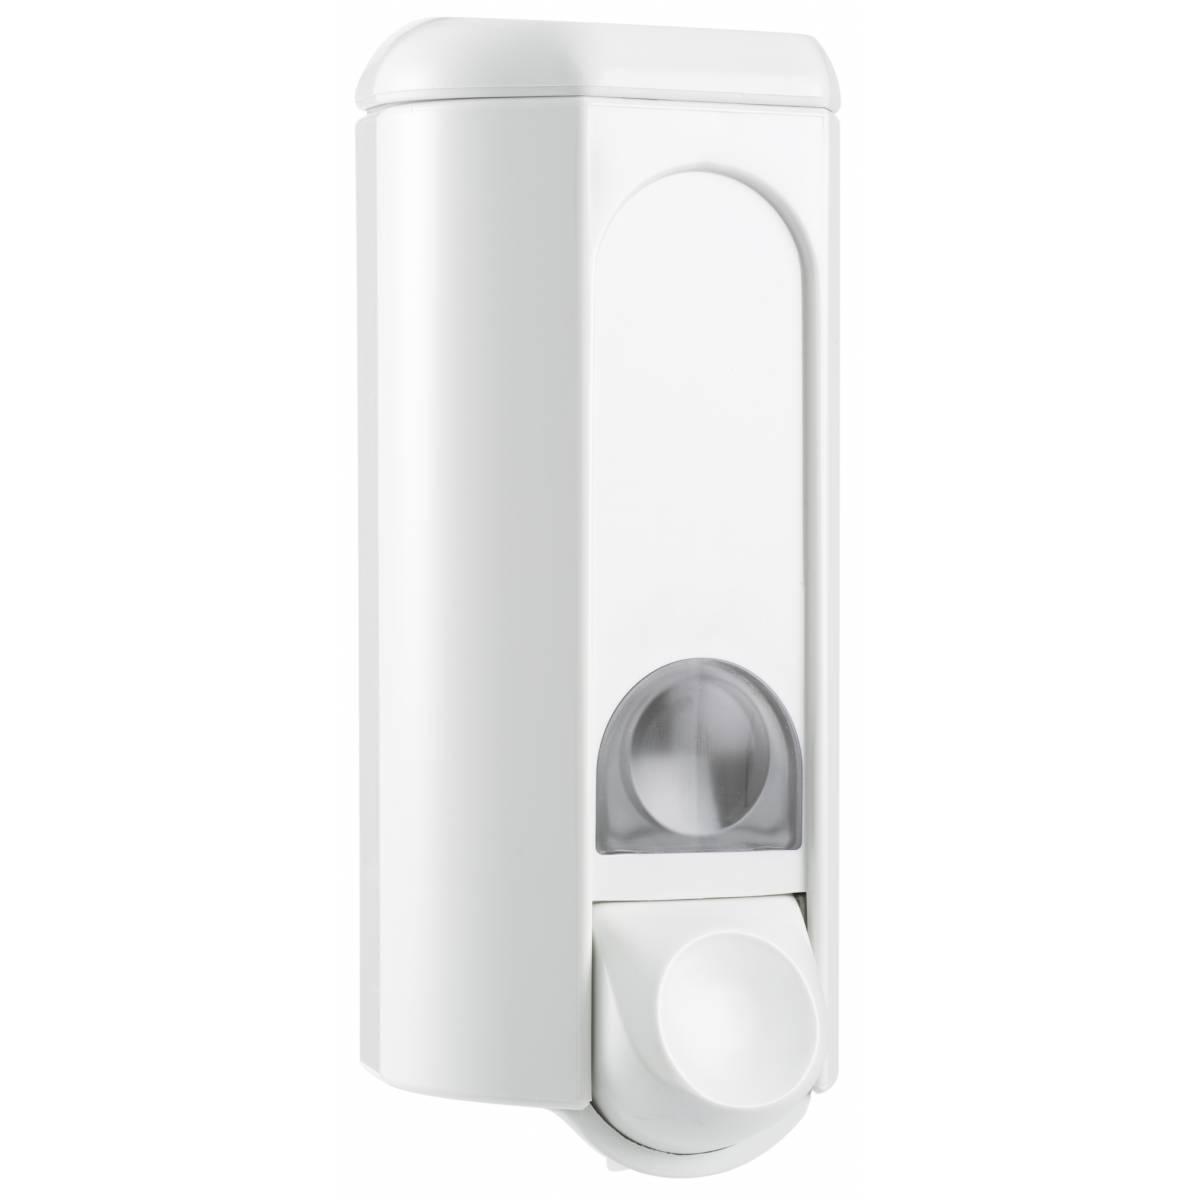 Дозатор жидкого мыла Mar Plast ACQUALBA (562WIN) A56211WIN Mar Plast